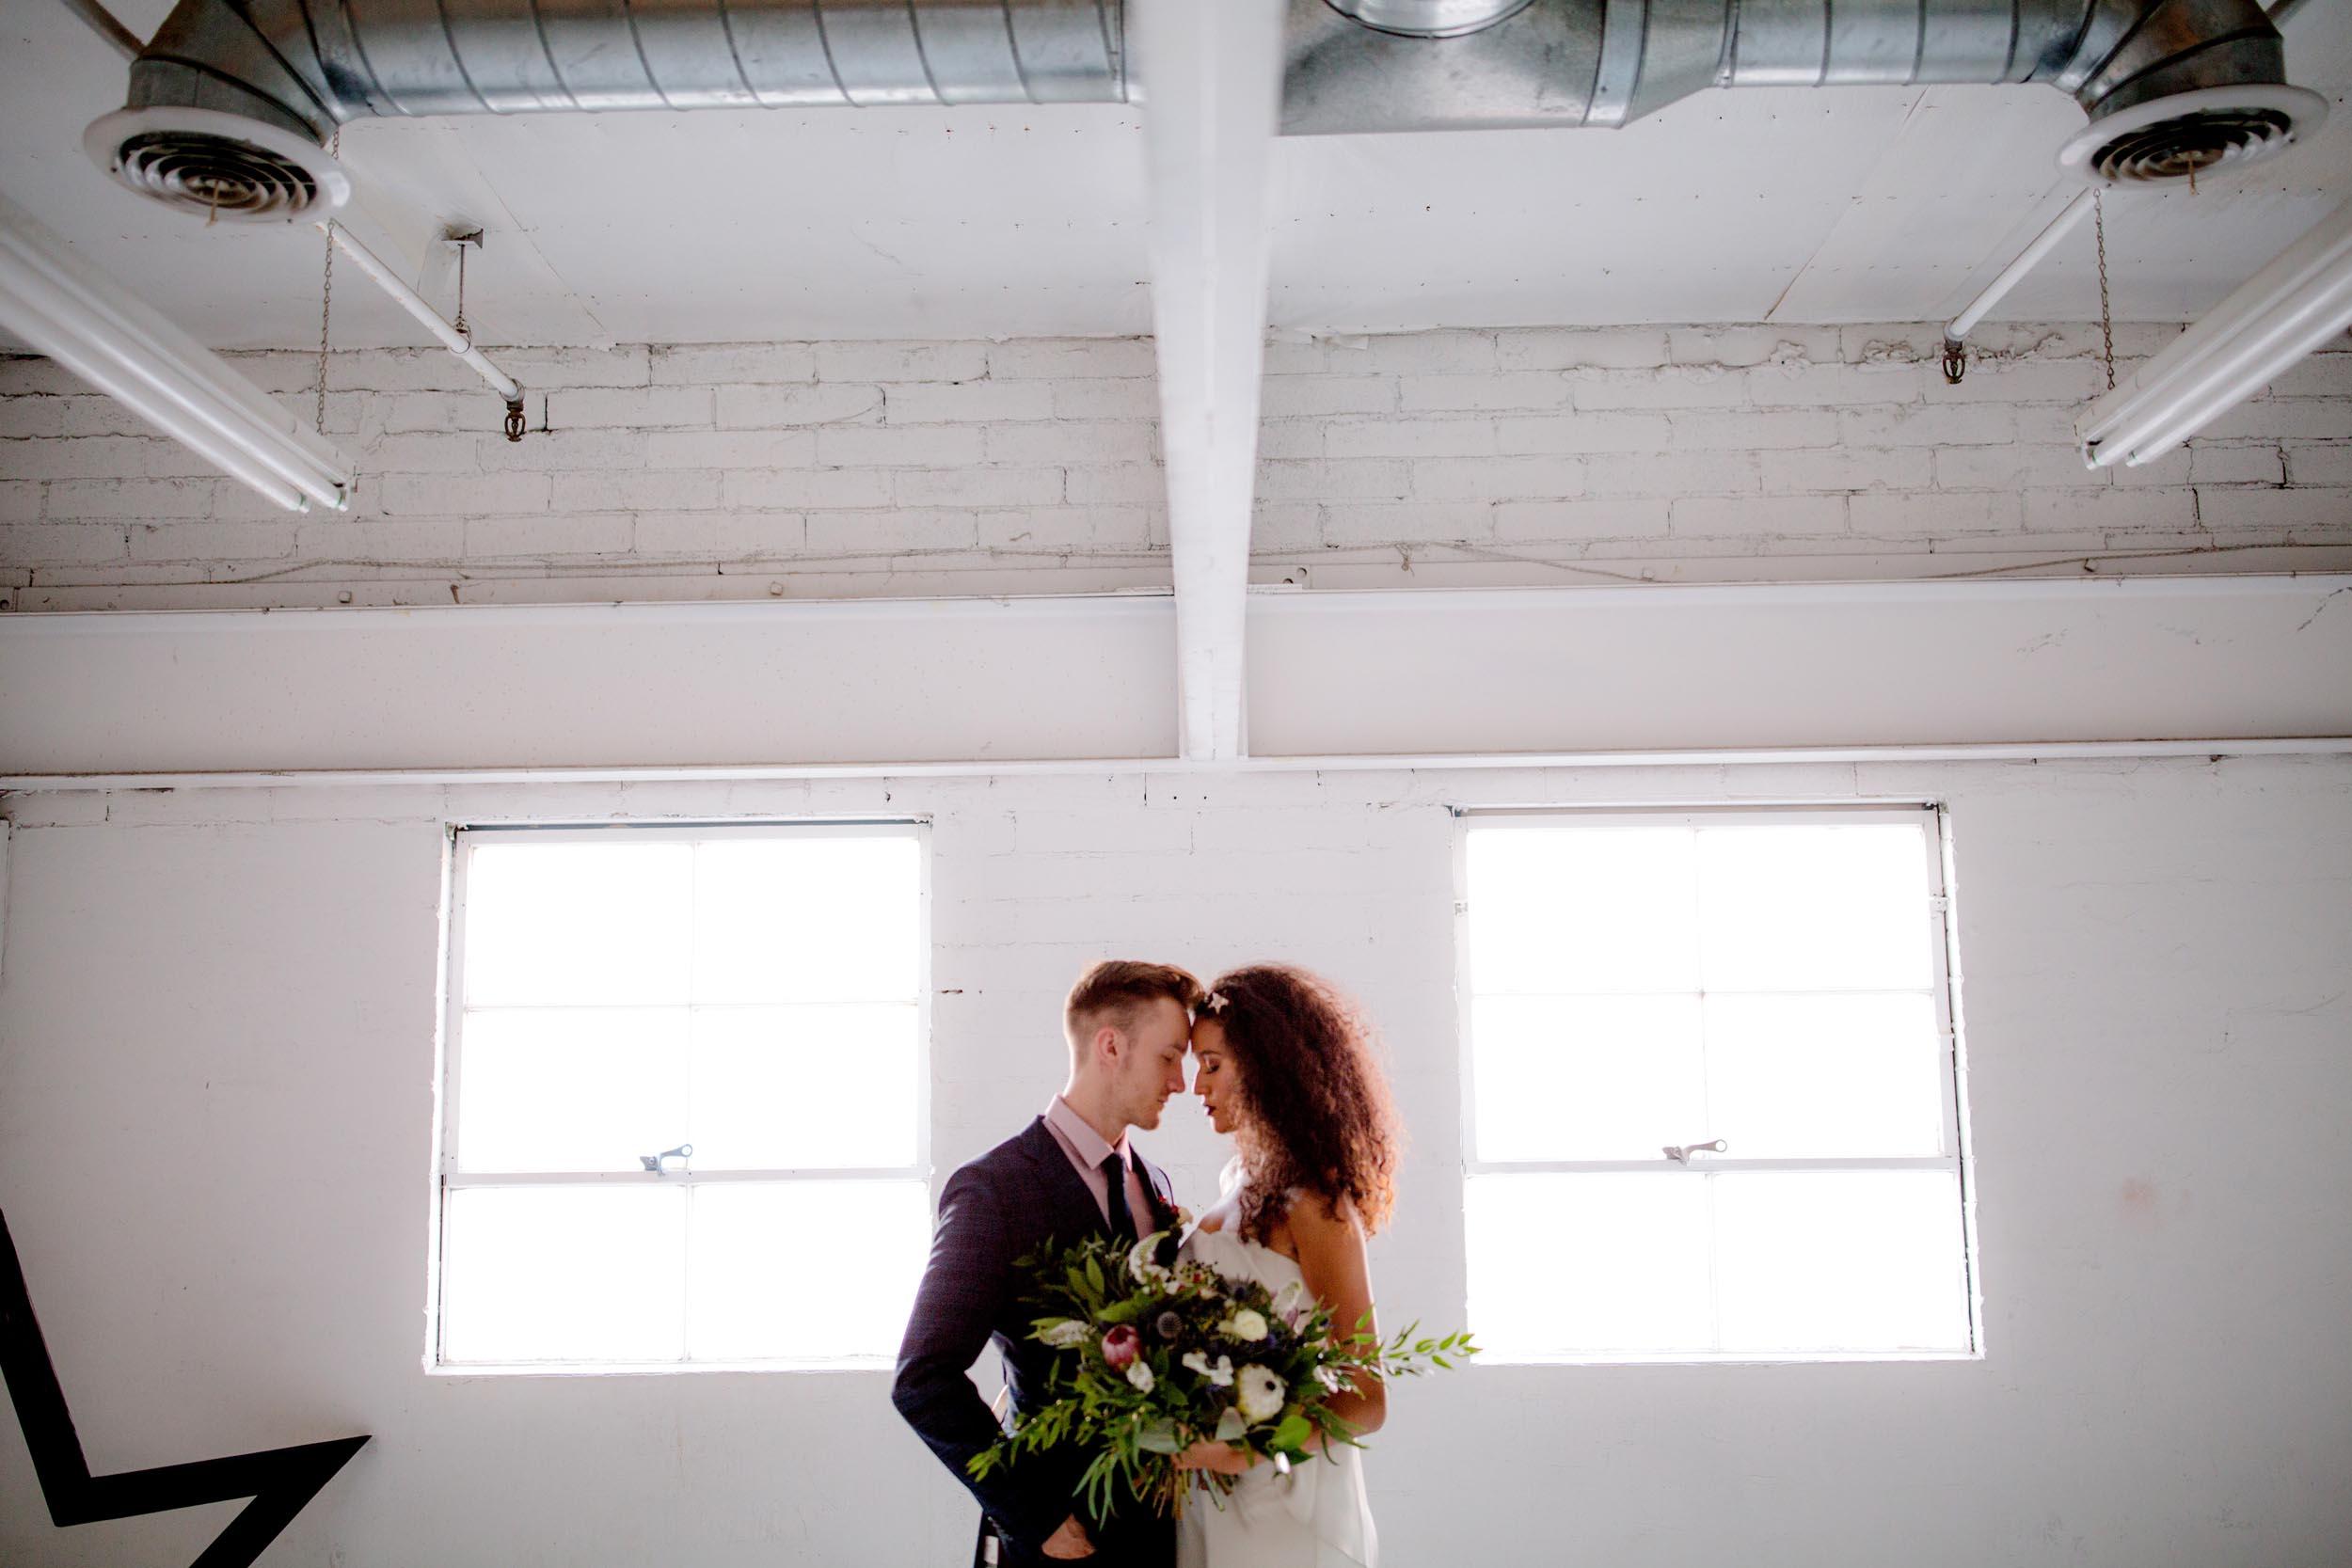 weddings-starsstripes-34.jpg